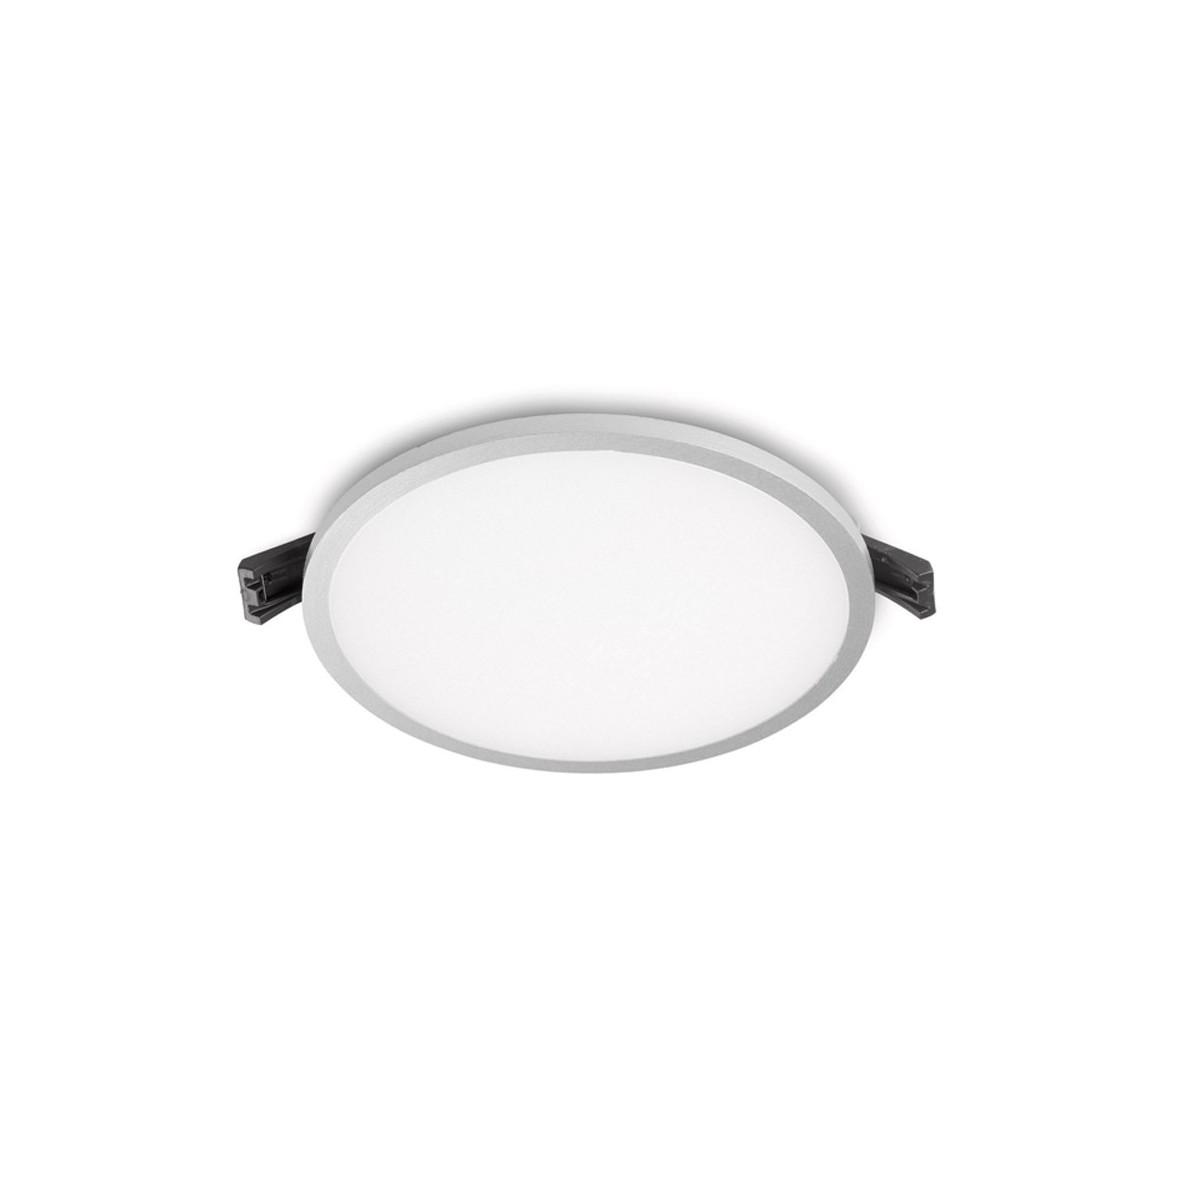 Luminaria LED para empotrar 30W 3000K Kaju blanco